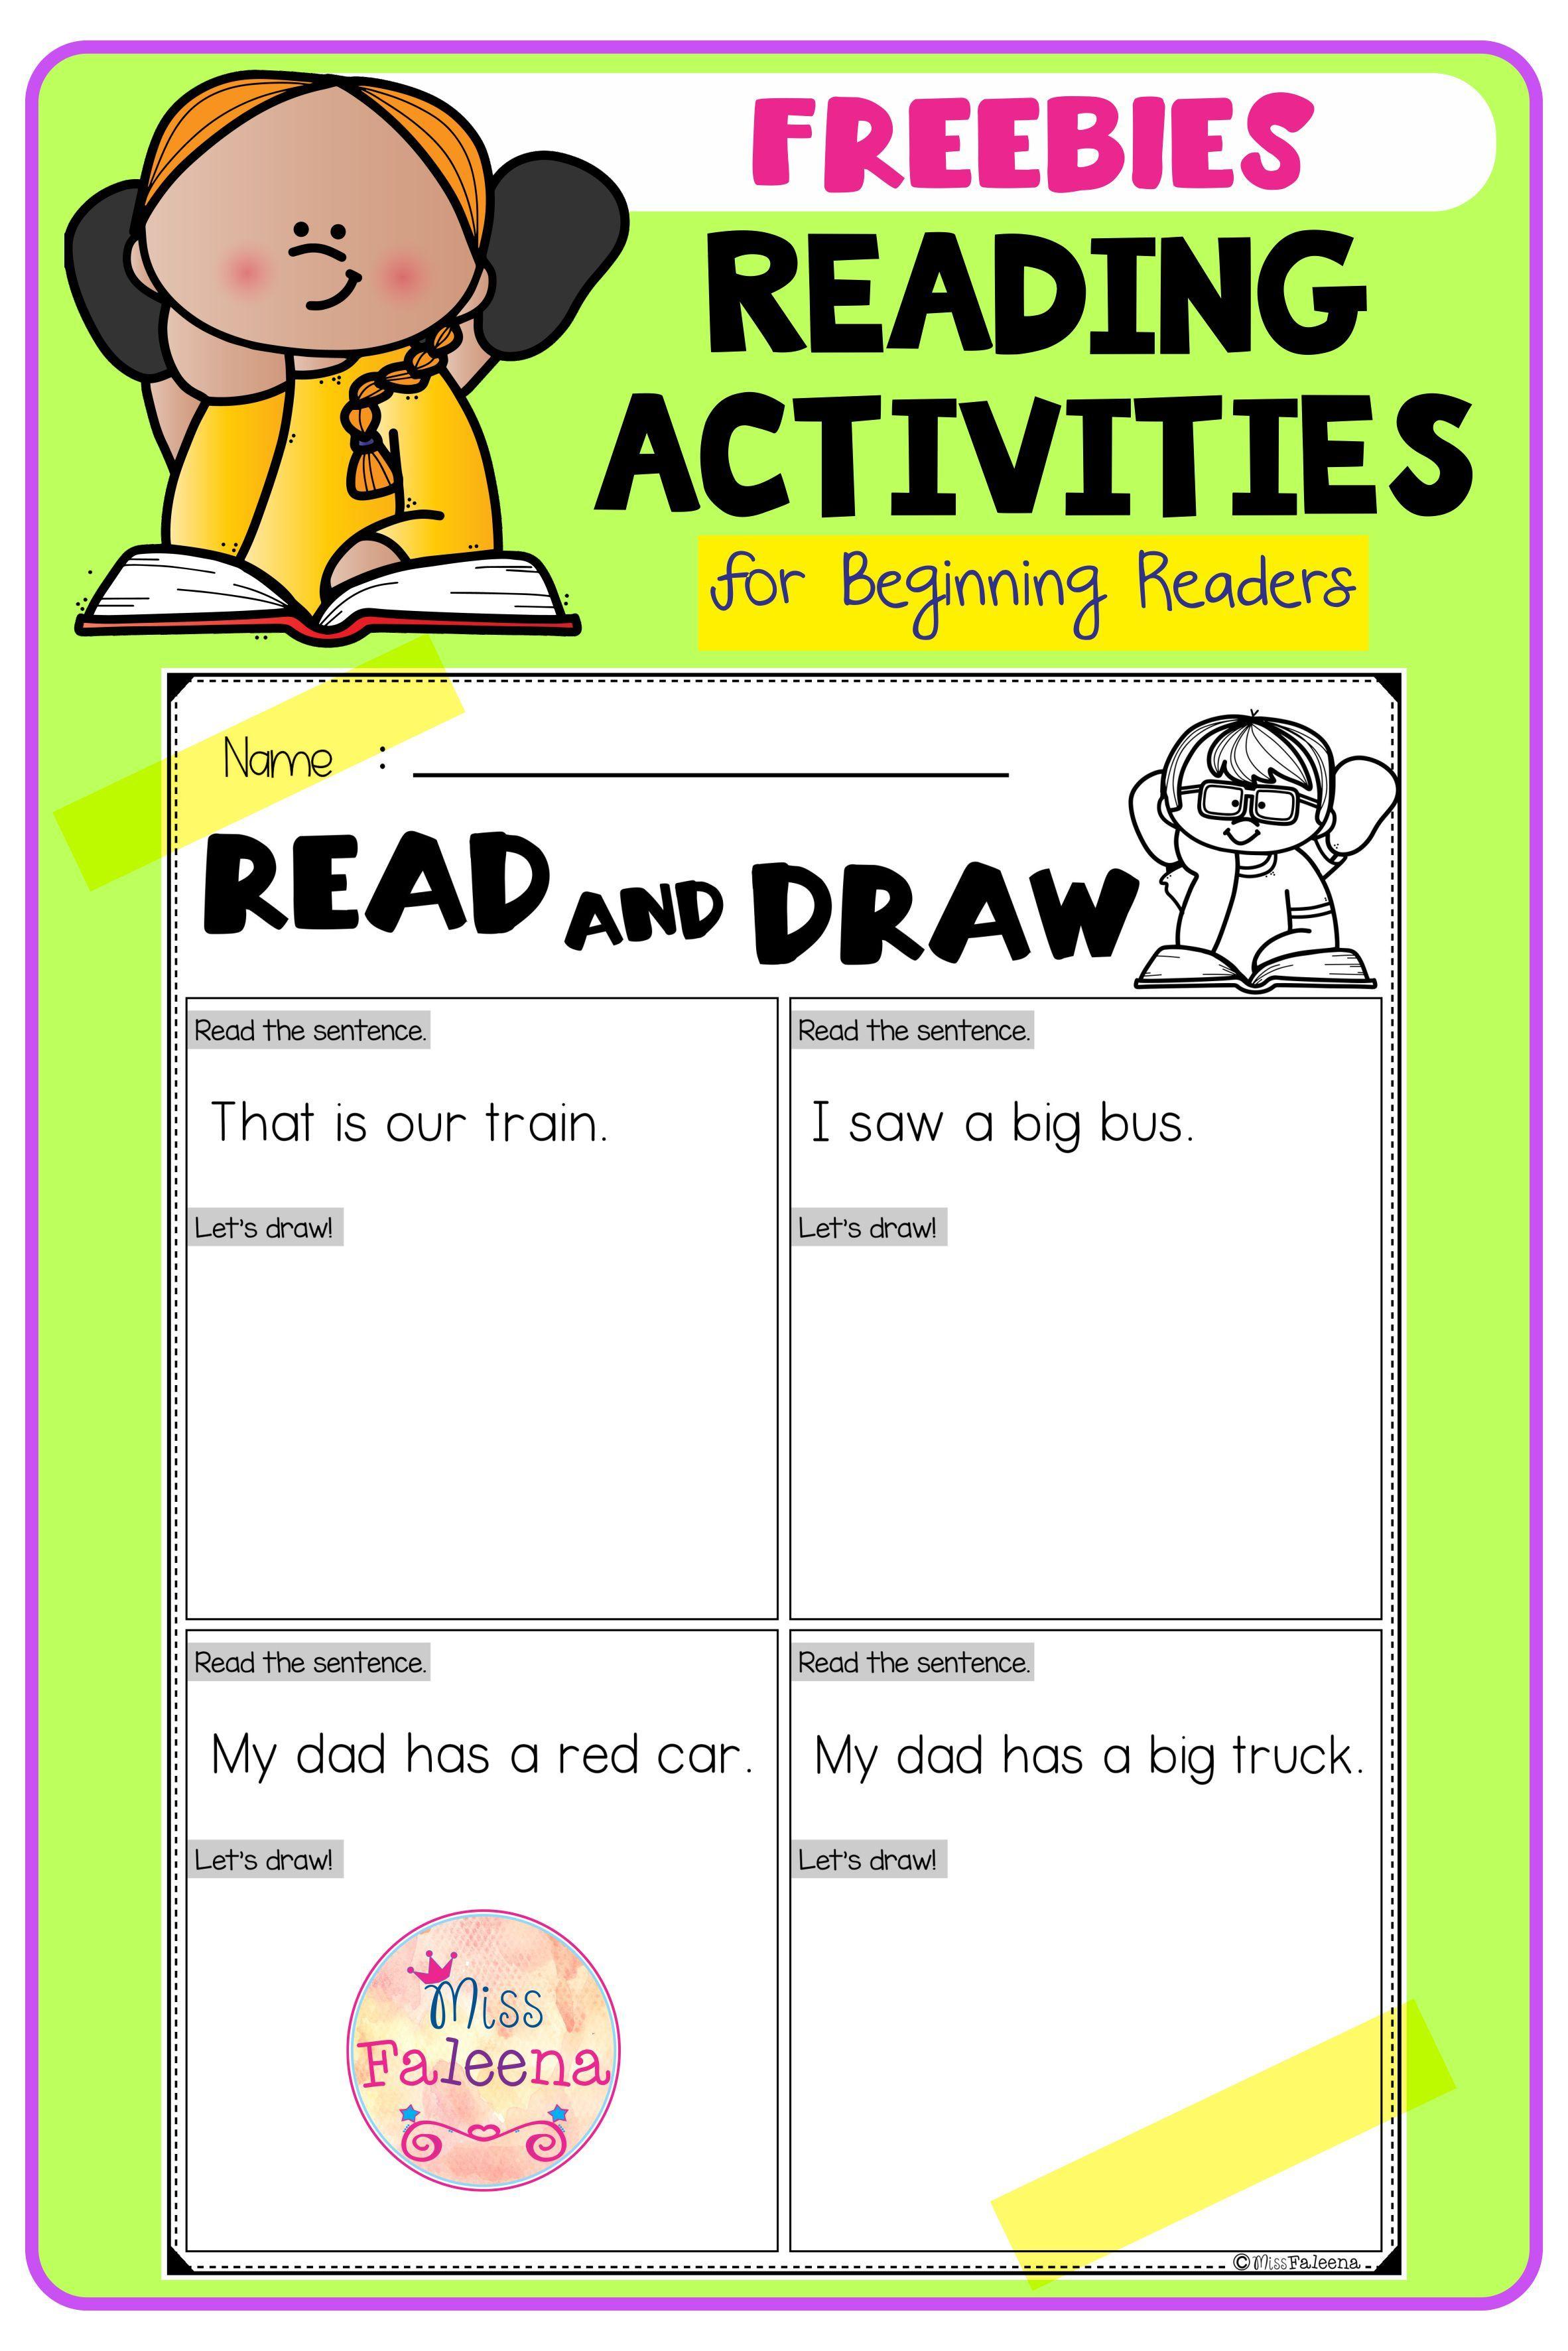 Free Reading Activities Reading Activities Reading Comprehension Activities Teaching First Grade [ 3544 x 2364 Pixel ]